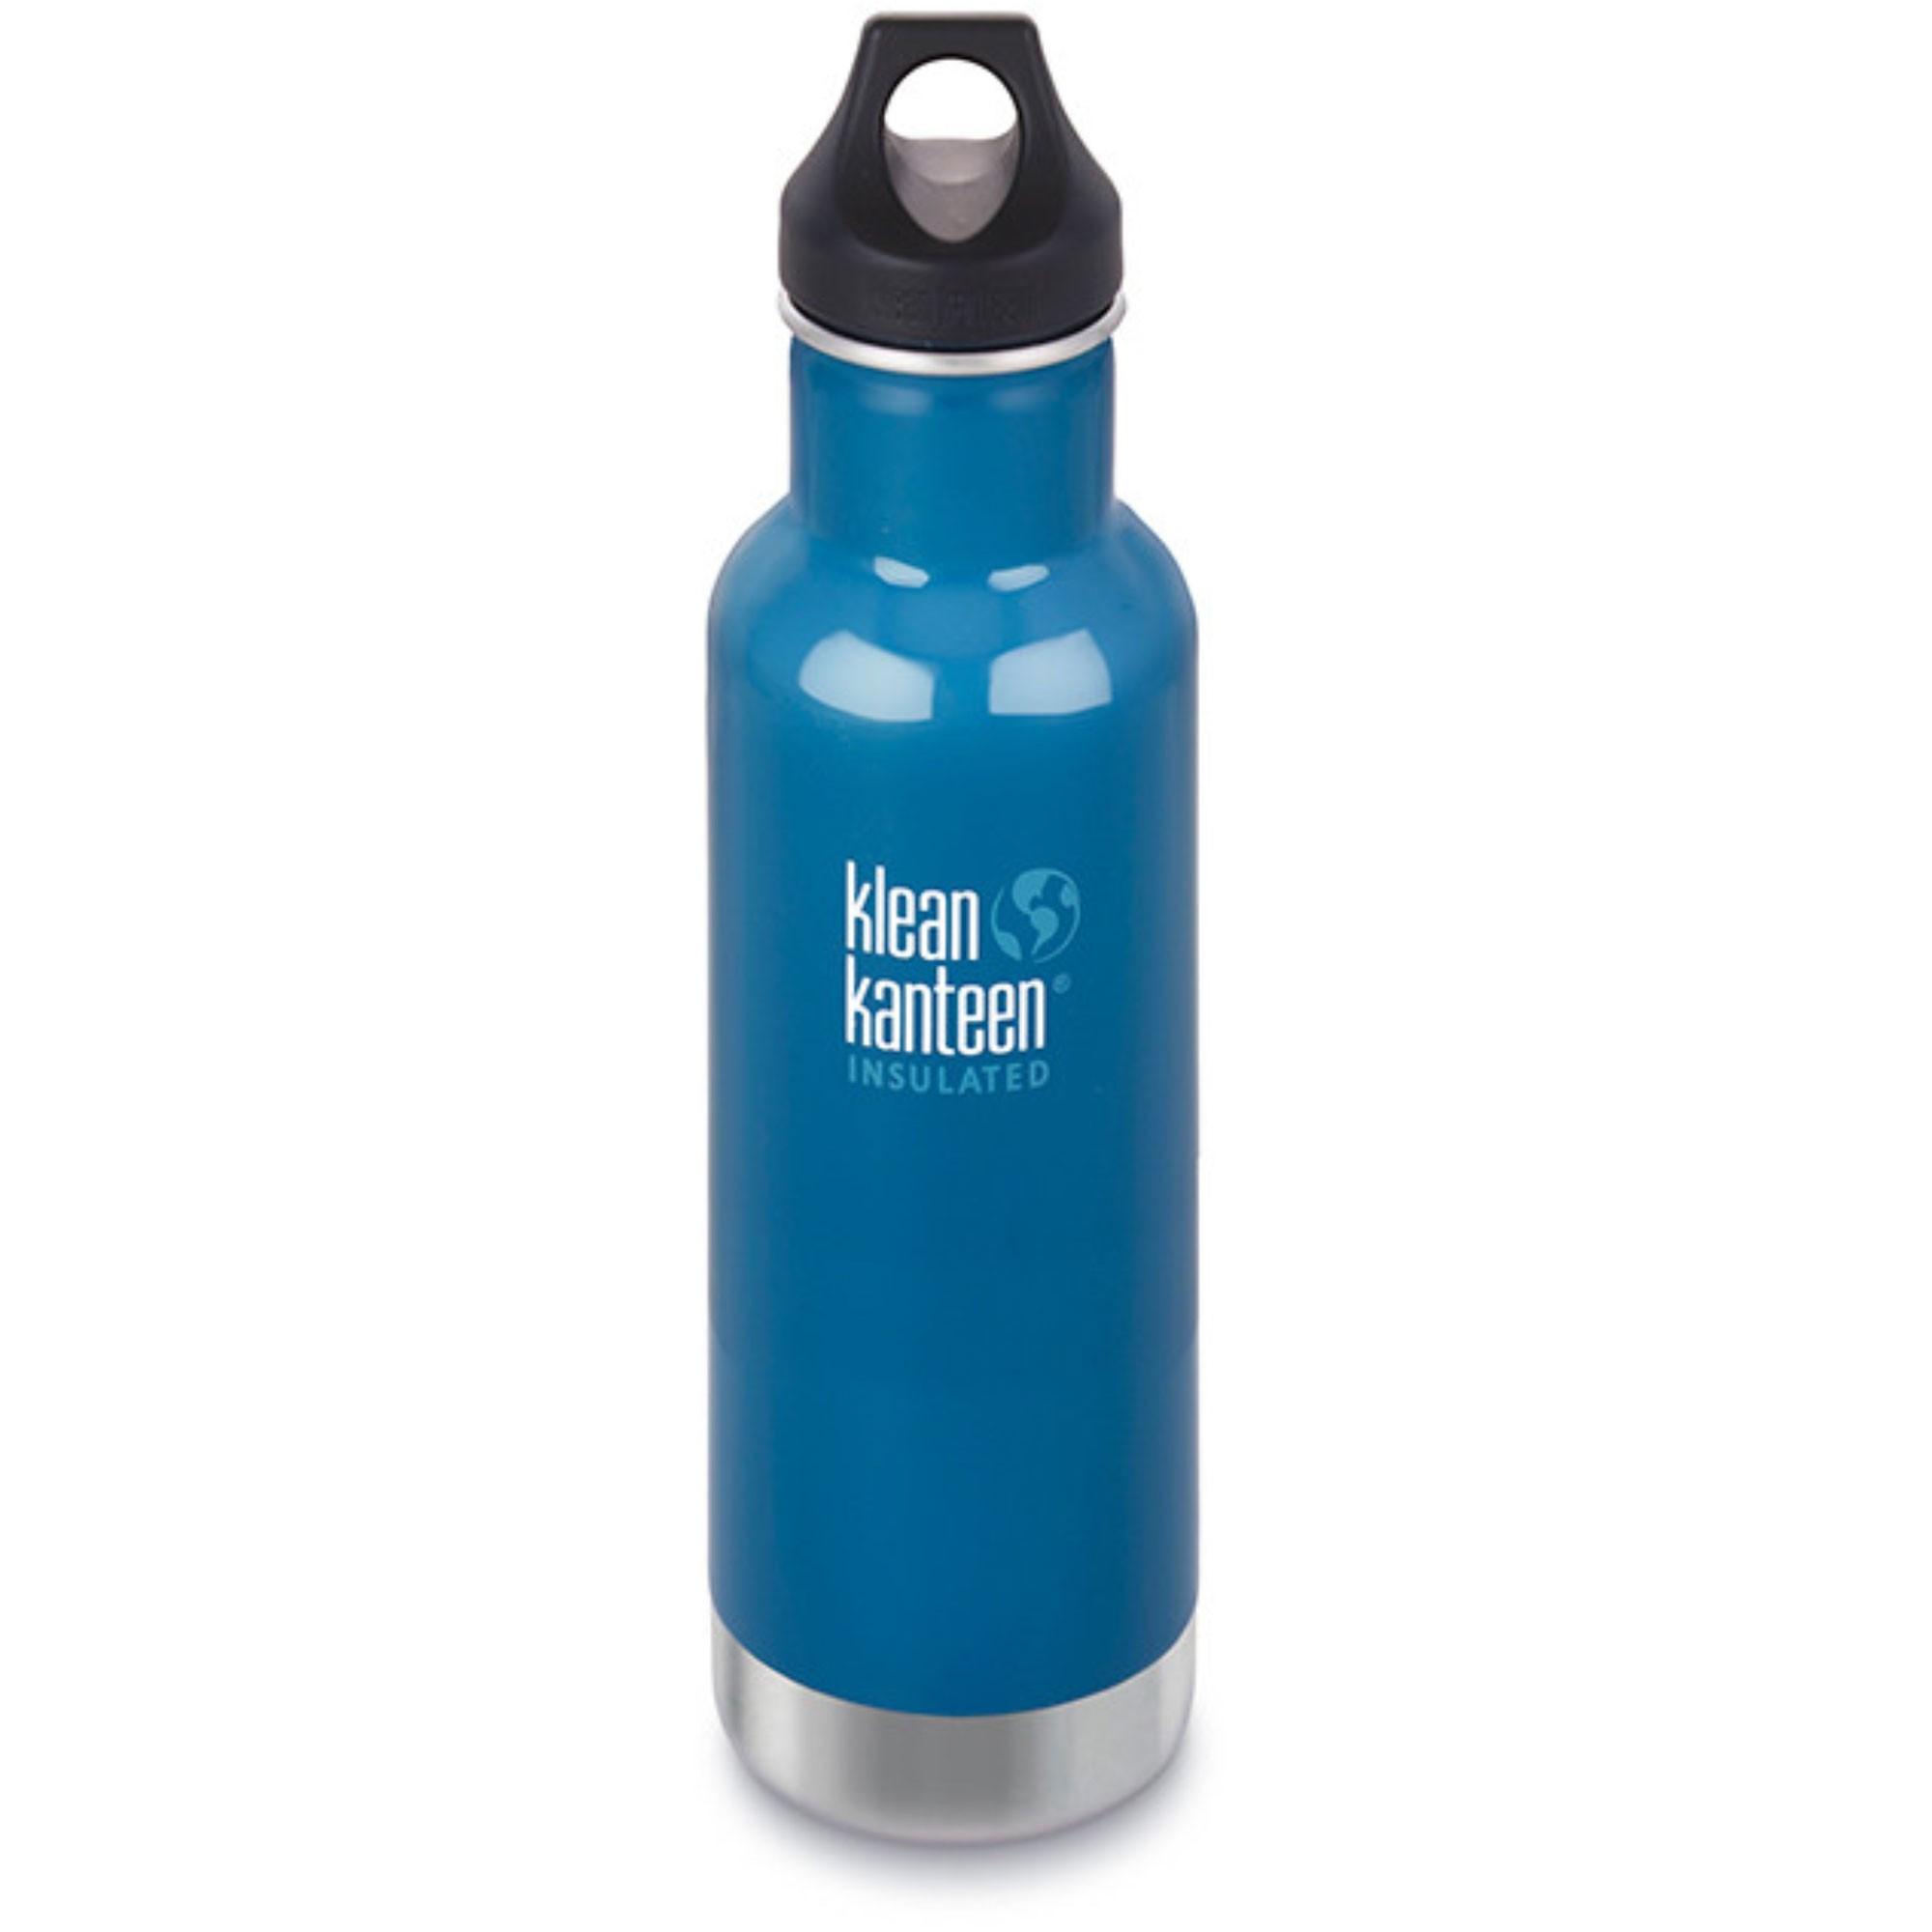 KLEAN KANTEEN - Classic Insulated Flask - 592ml - Winter Lake